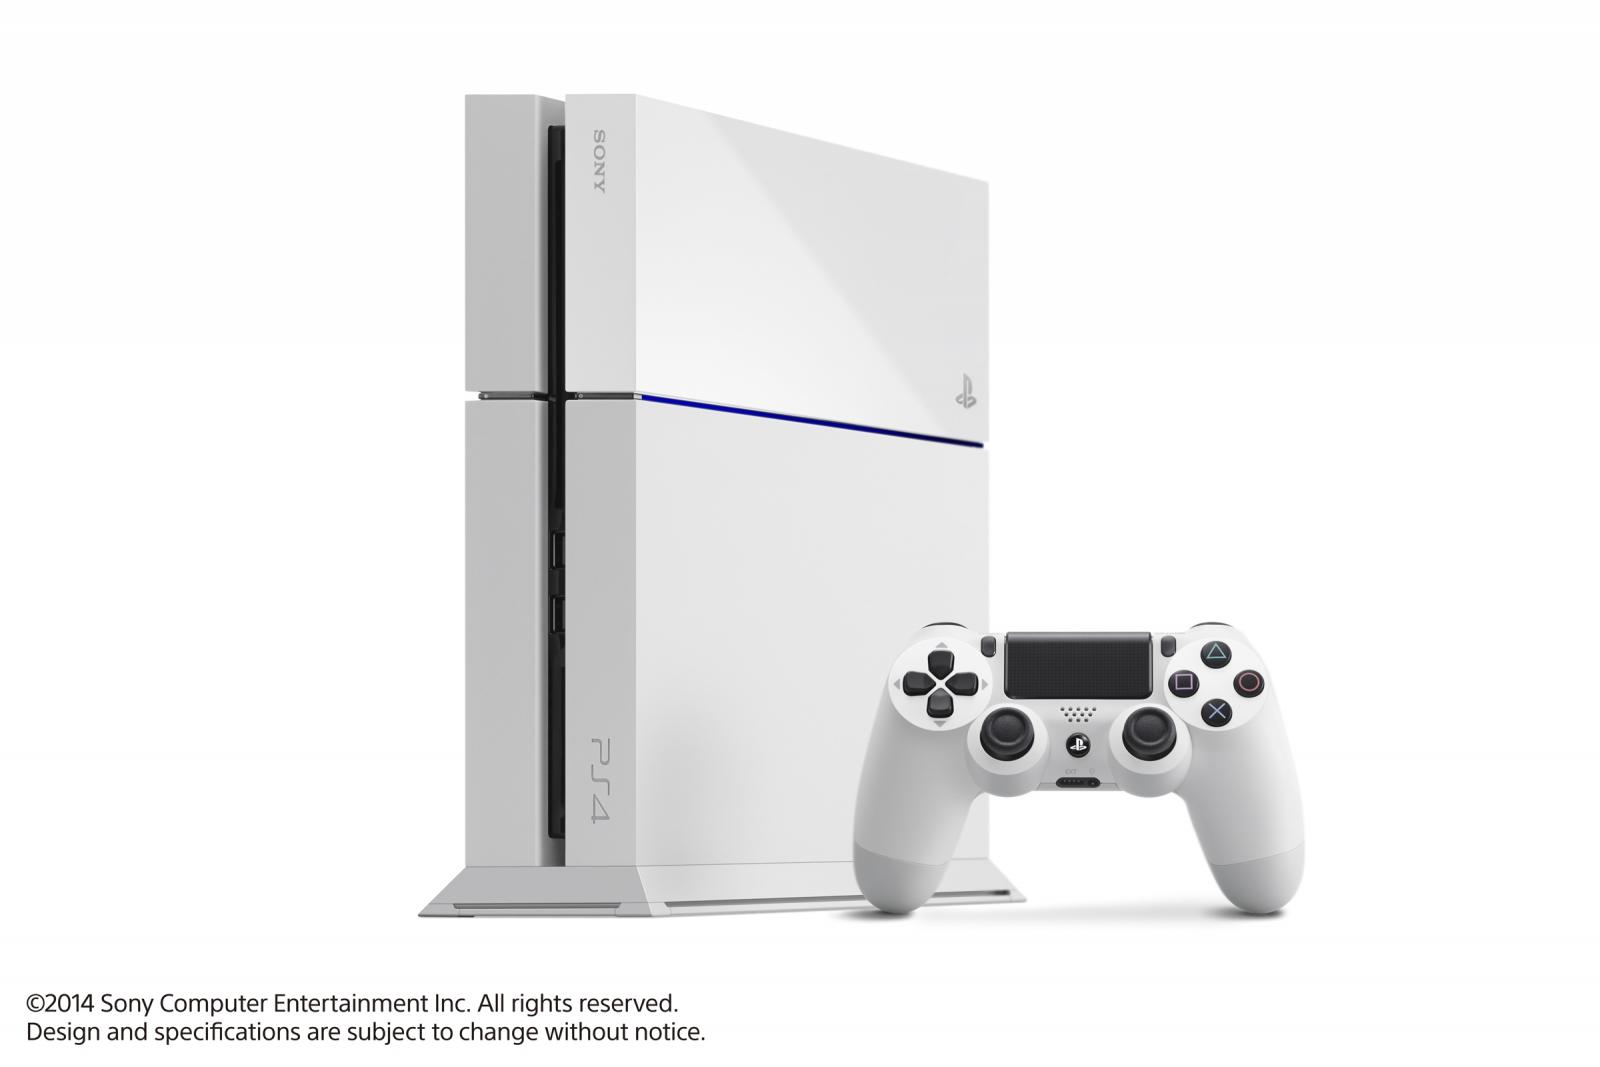 White PS4 Black Friday Deal for £299